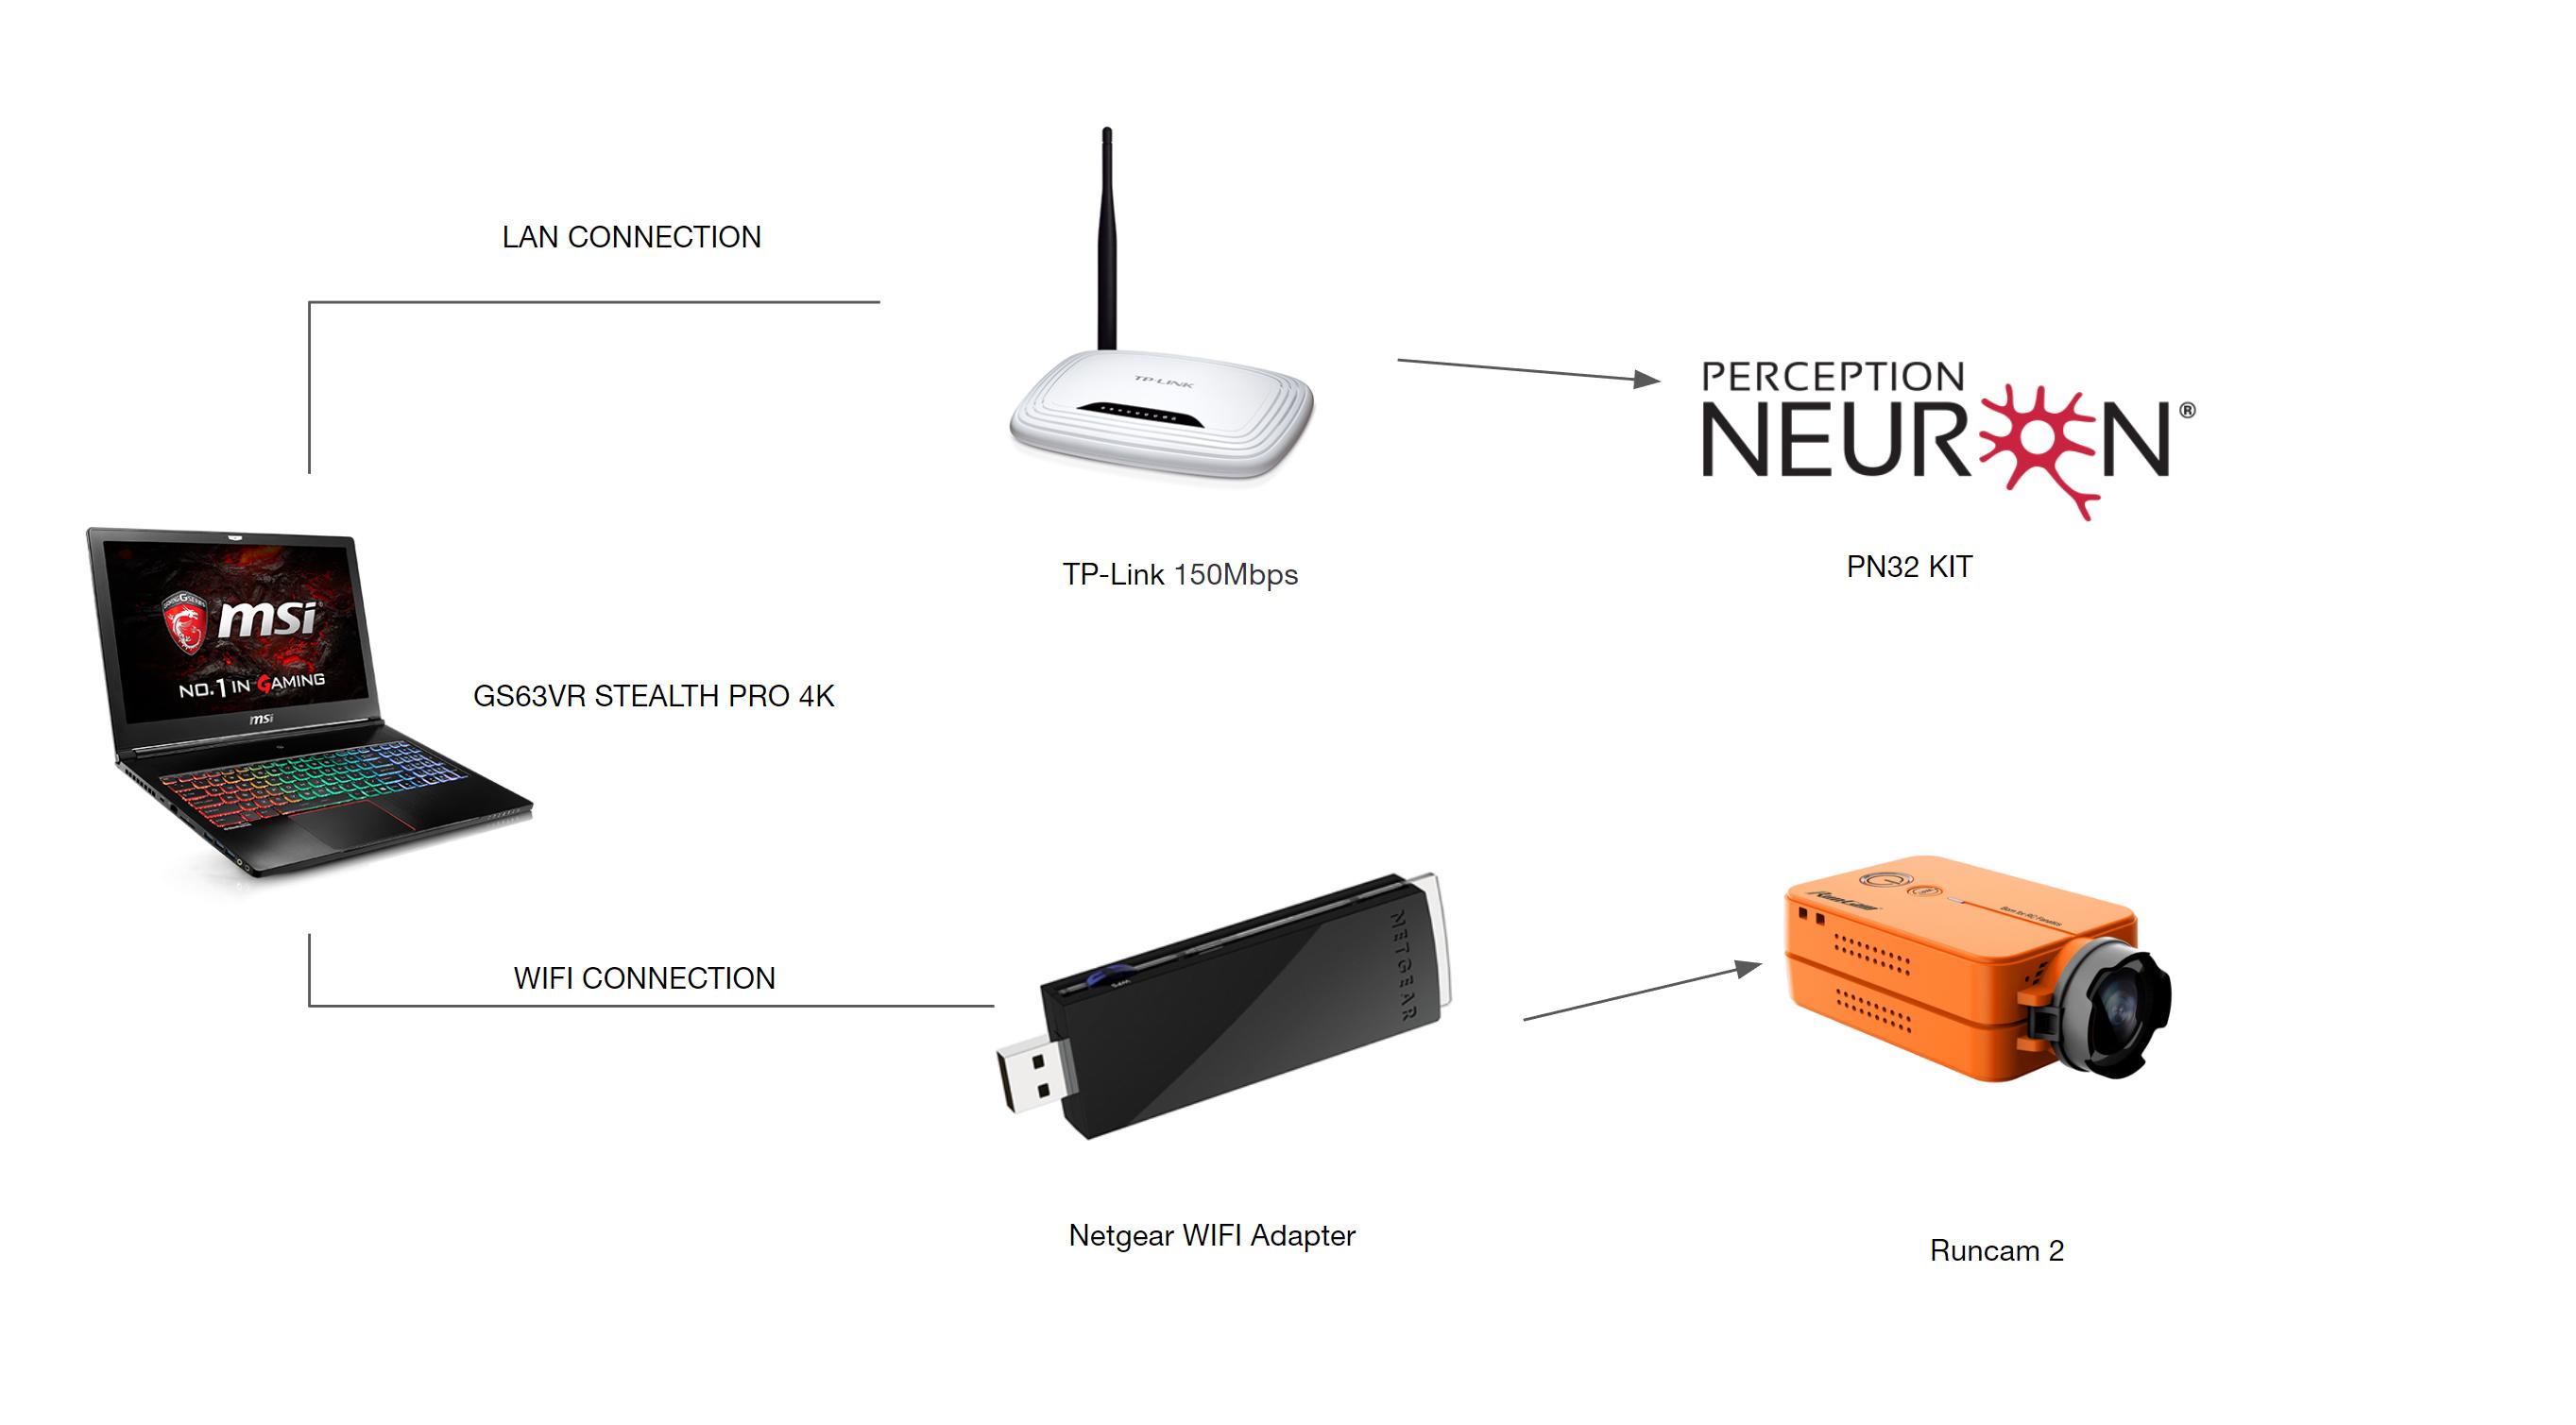 IP camera configuration for FACERIG – PERCEPTION NEURON